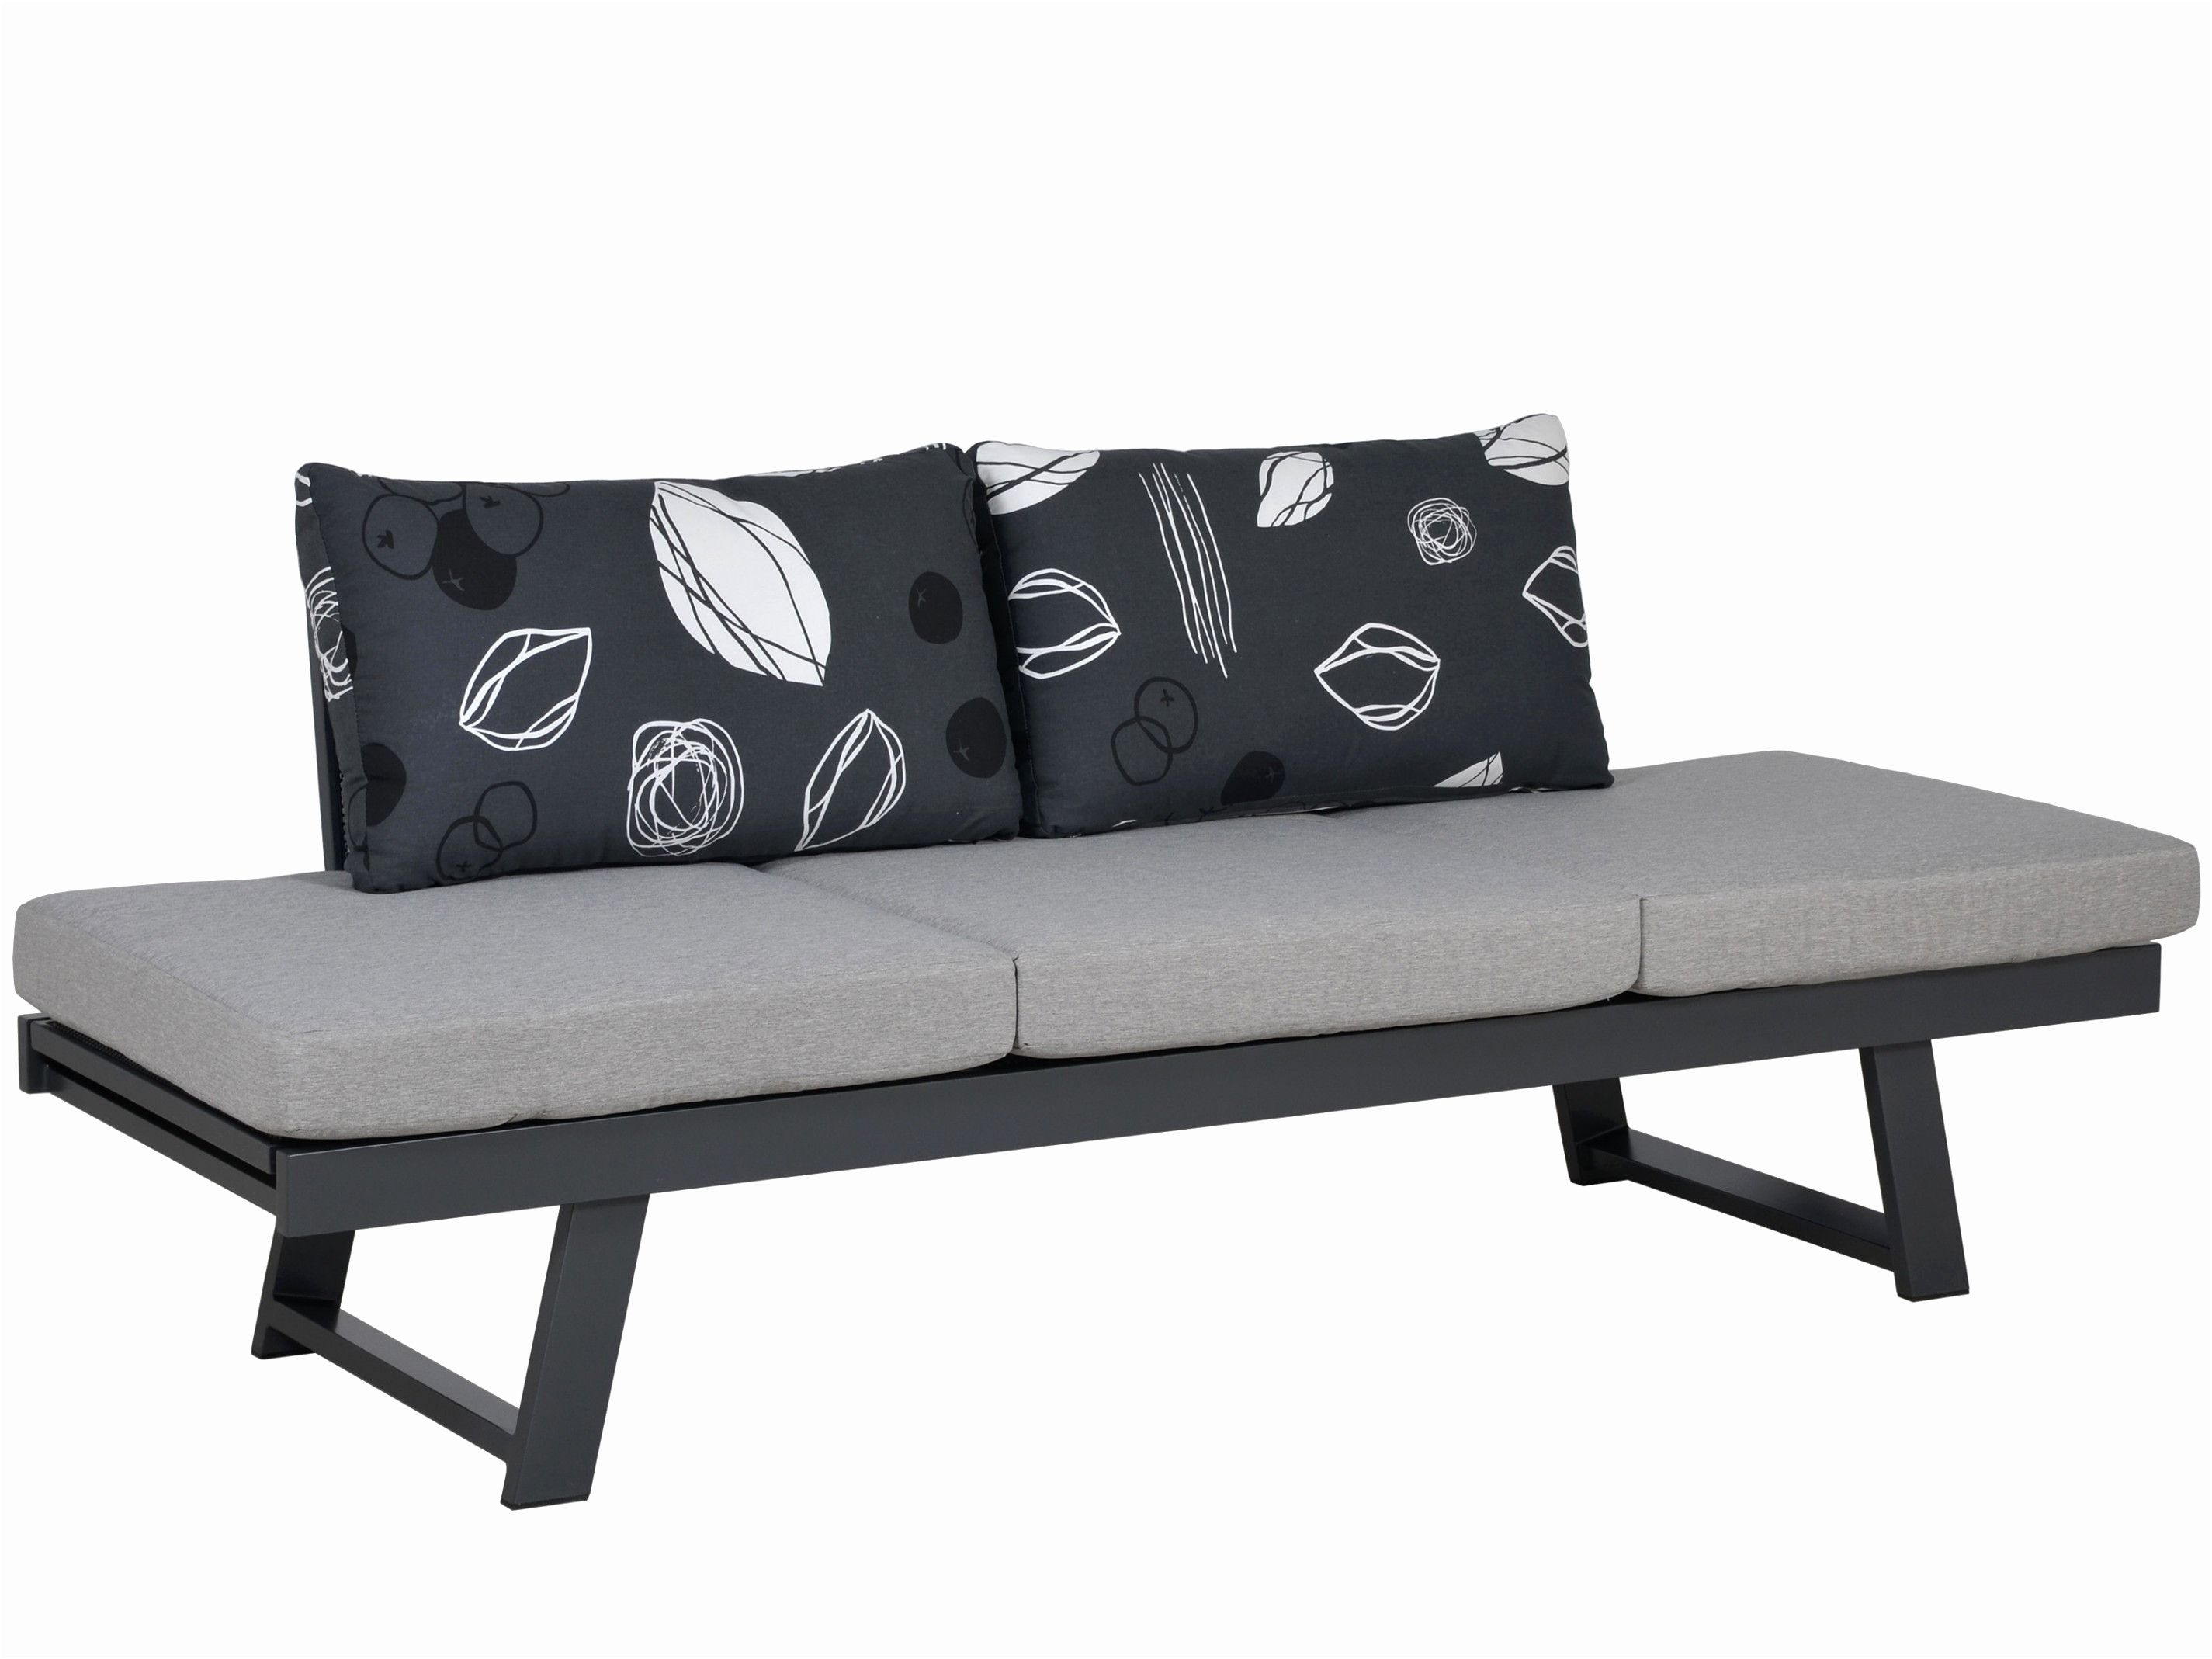 Lebhaft Ecksofa Wohnlandschaft In 2020 Cushions On Sofa White Furniture Living Room Sofa Design